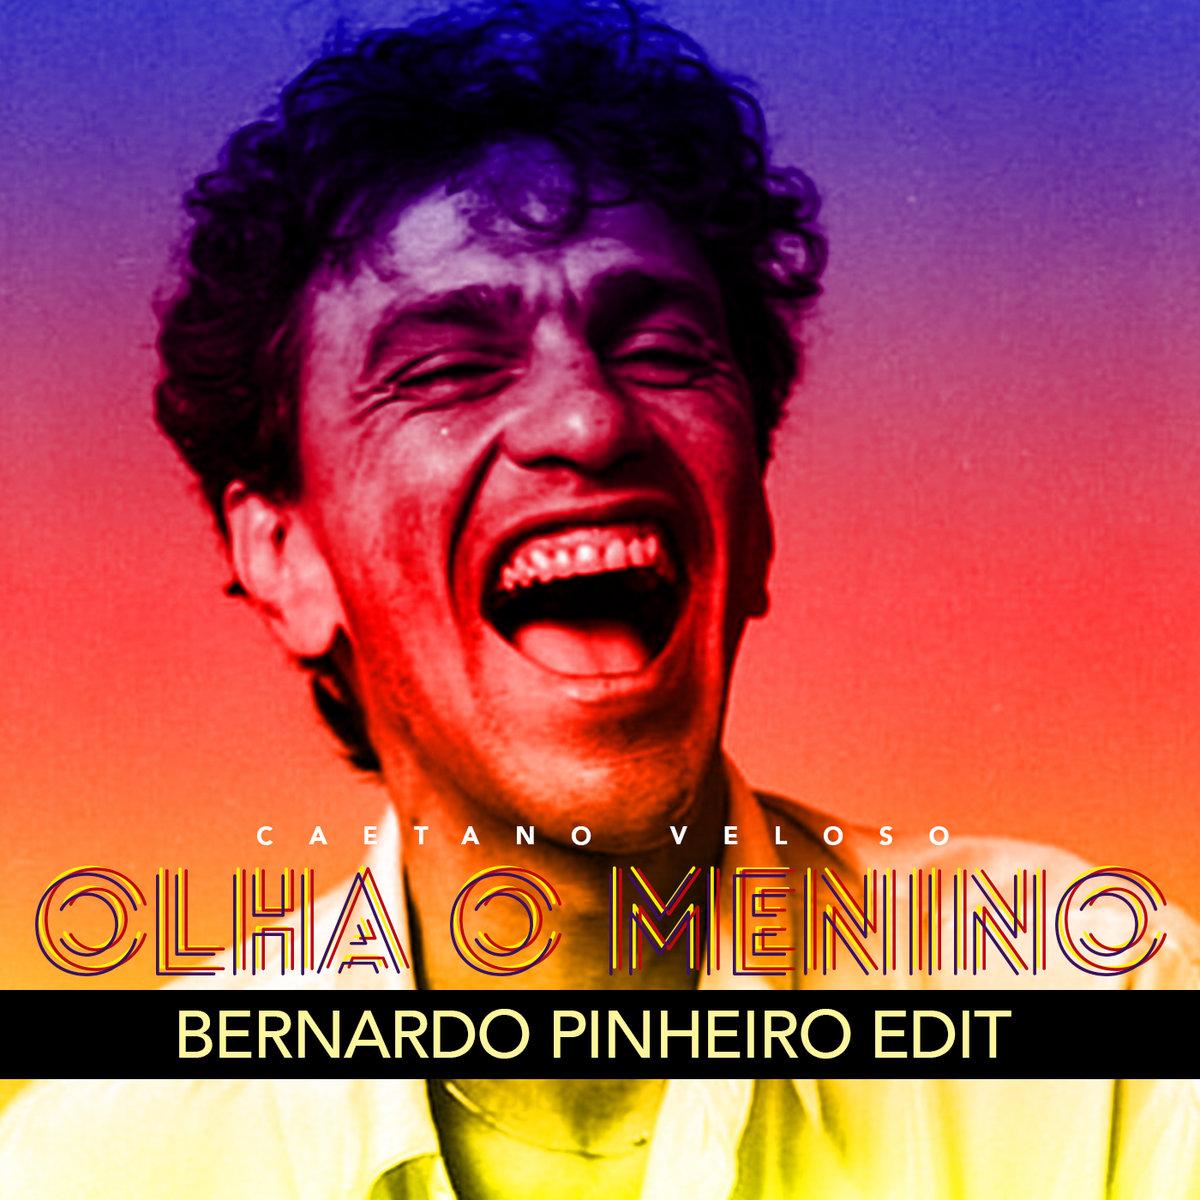 Caetano veloso the best of download torrent